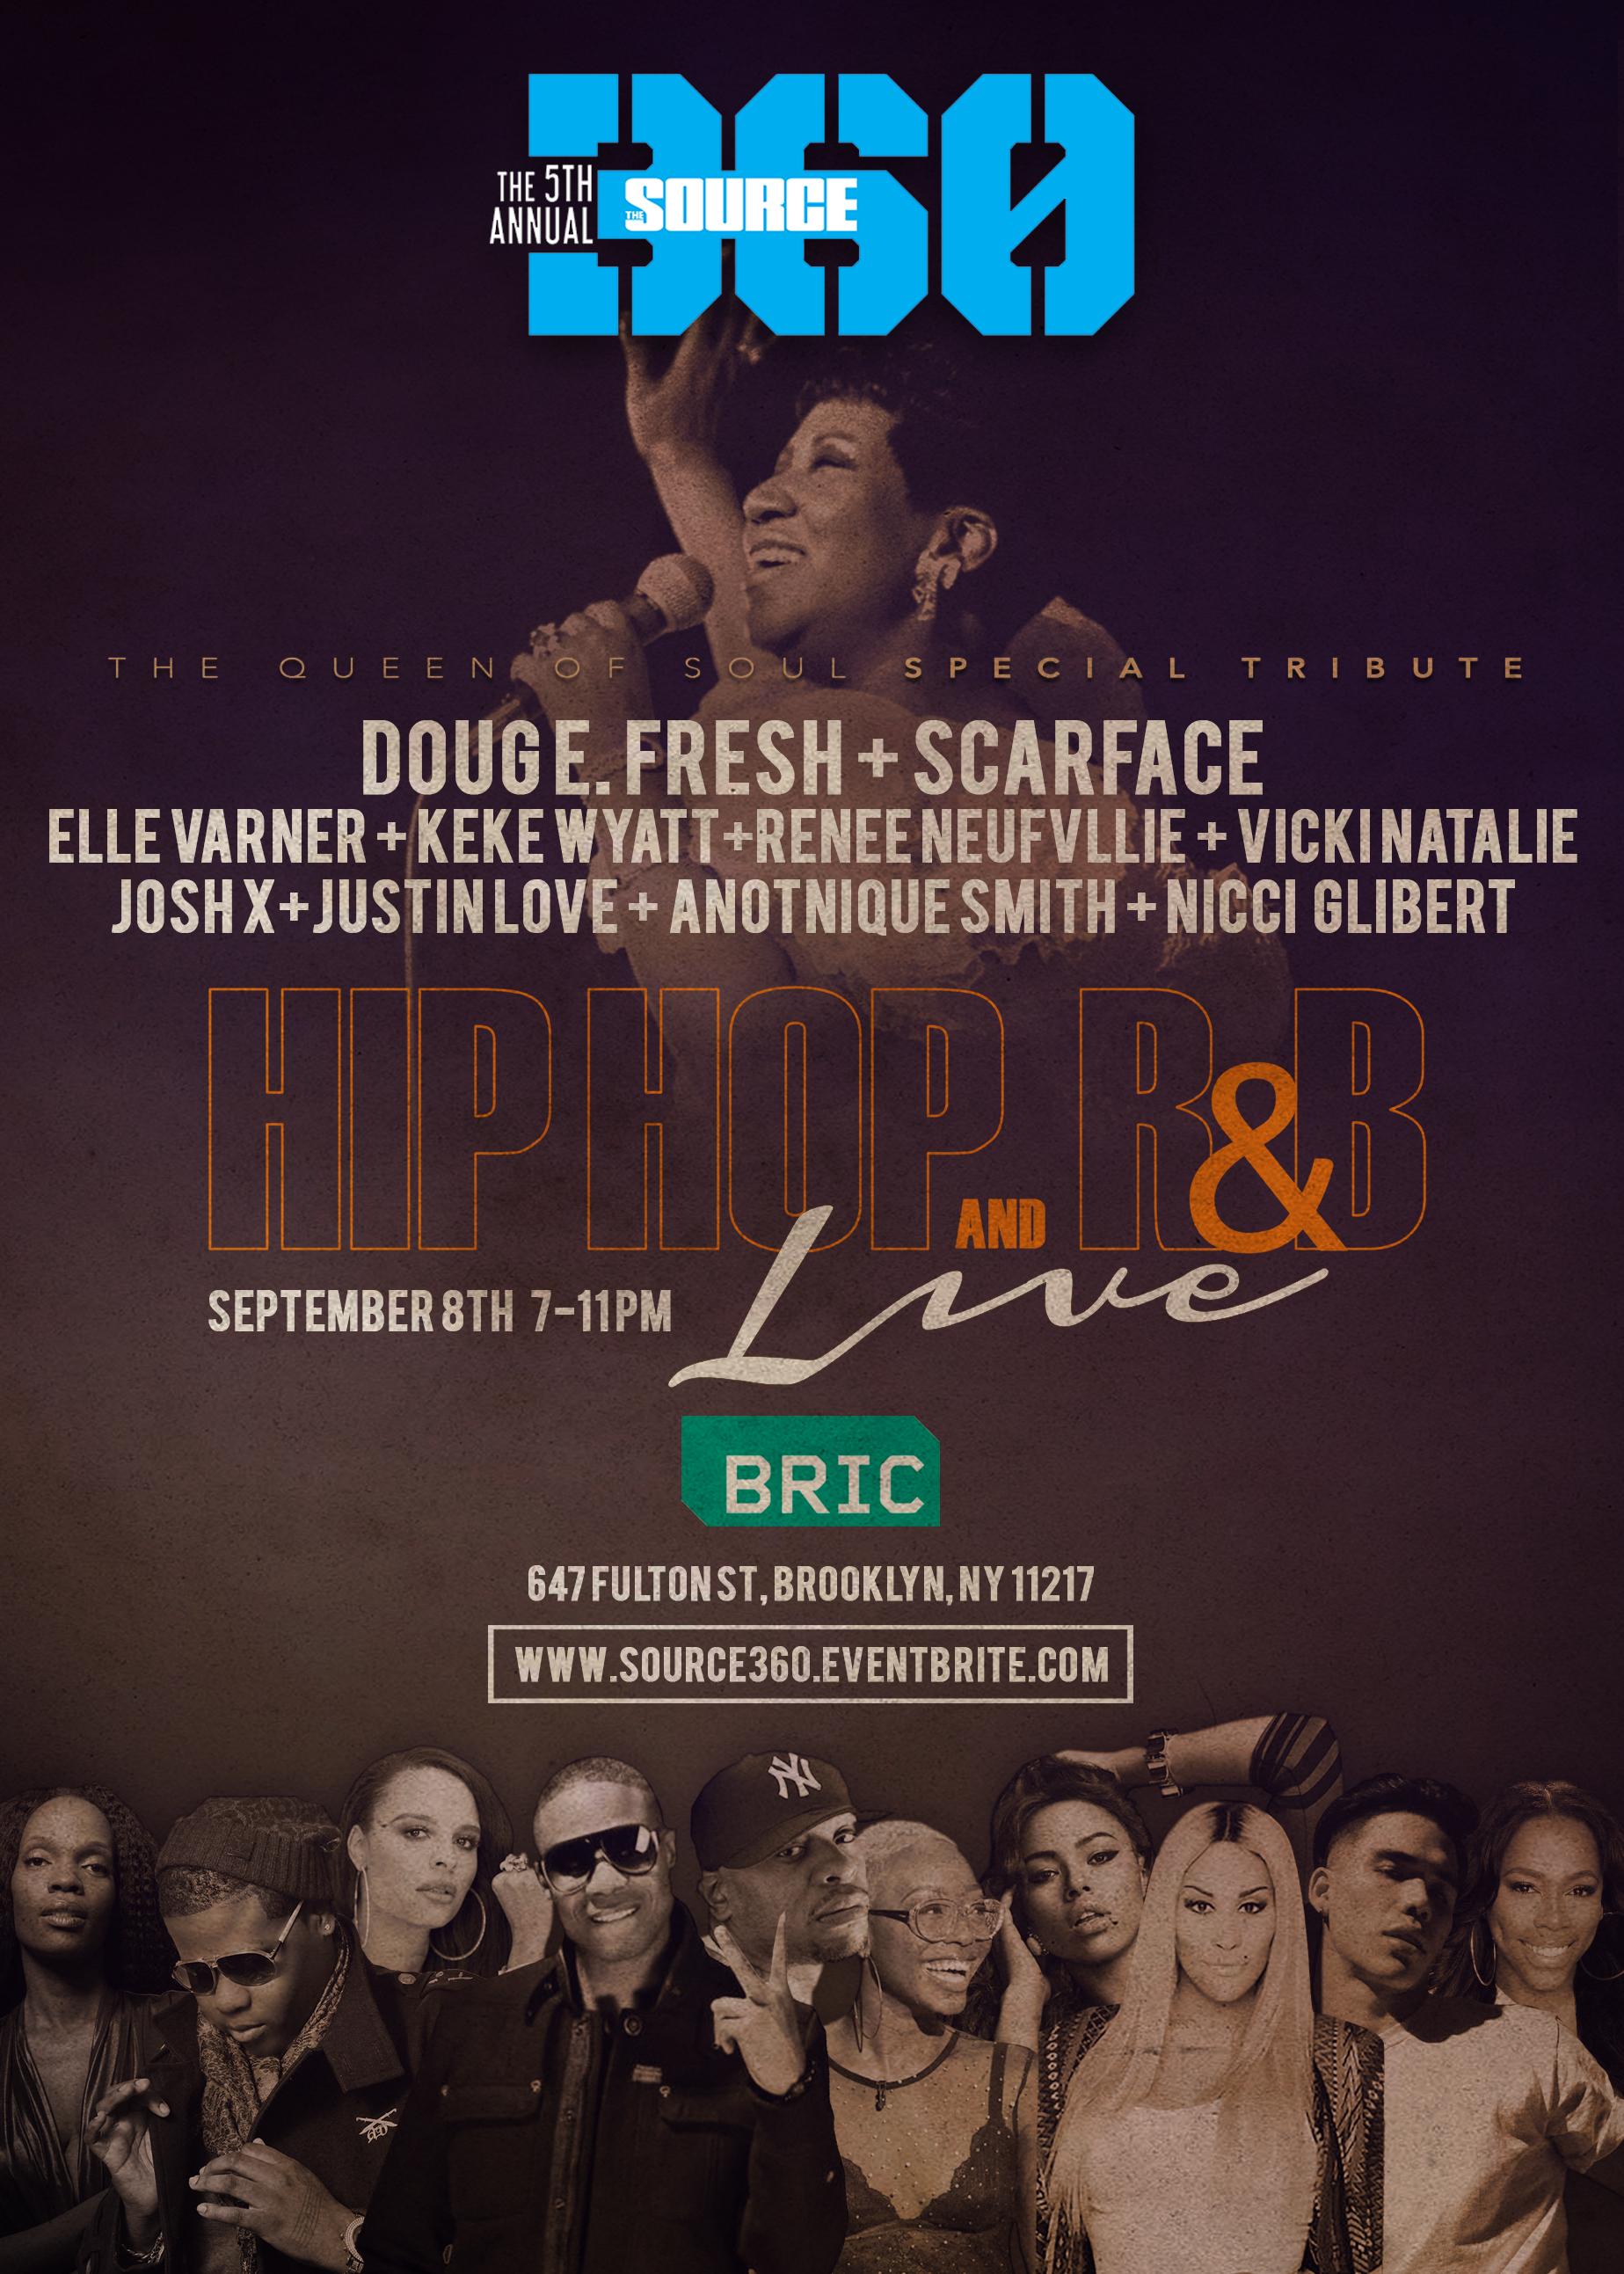 DougE.Fresh,Scarface,ElleVarner,KeKeWyatt&MoretoHonorArethaFranklinatthAnnualSOURCEFestival&MusicConference